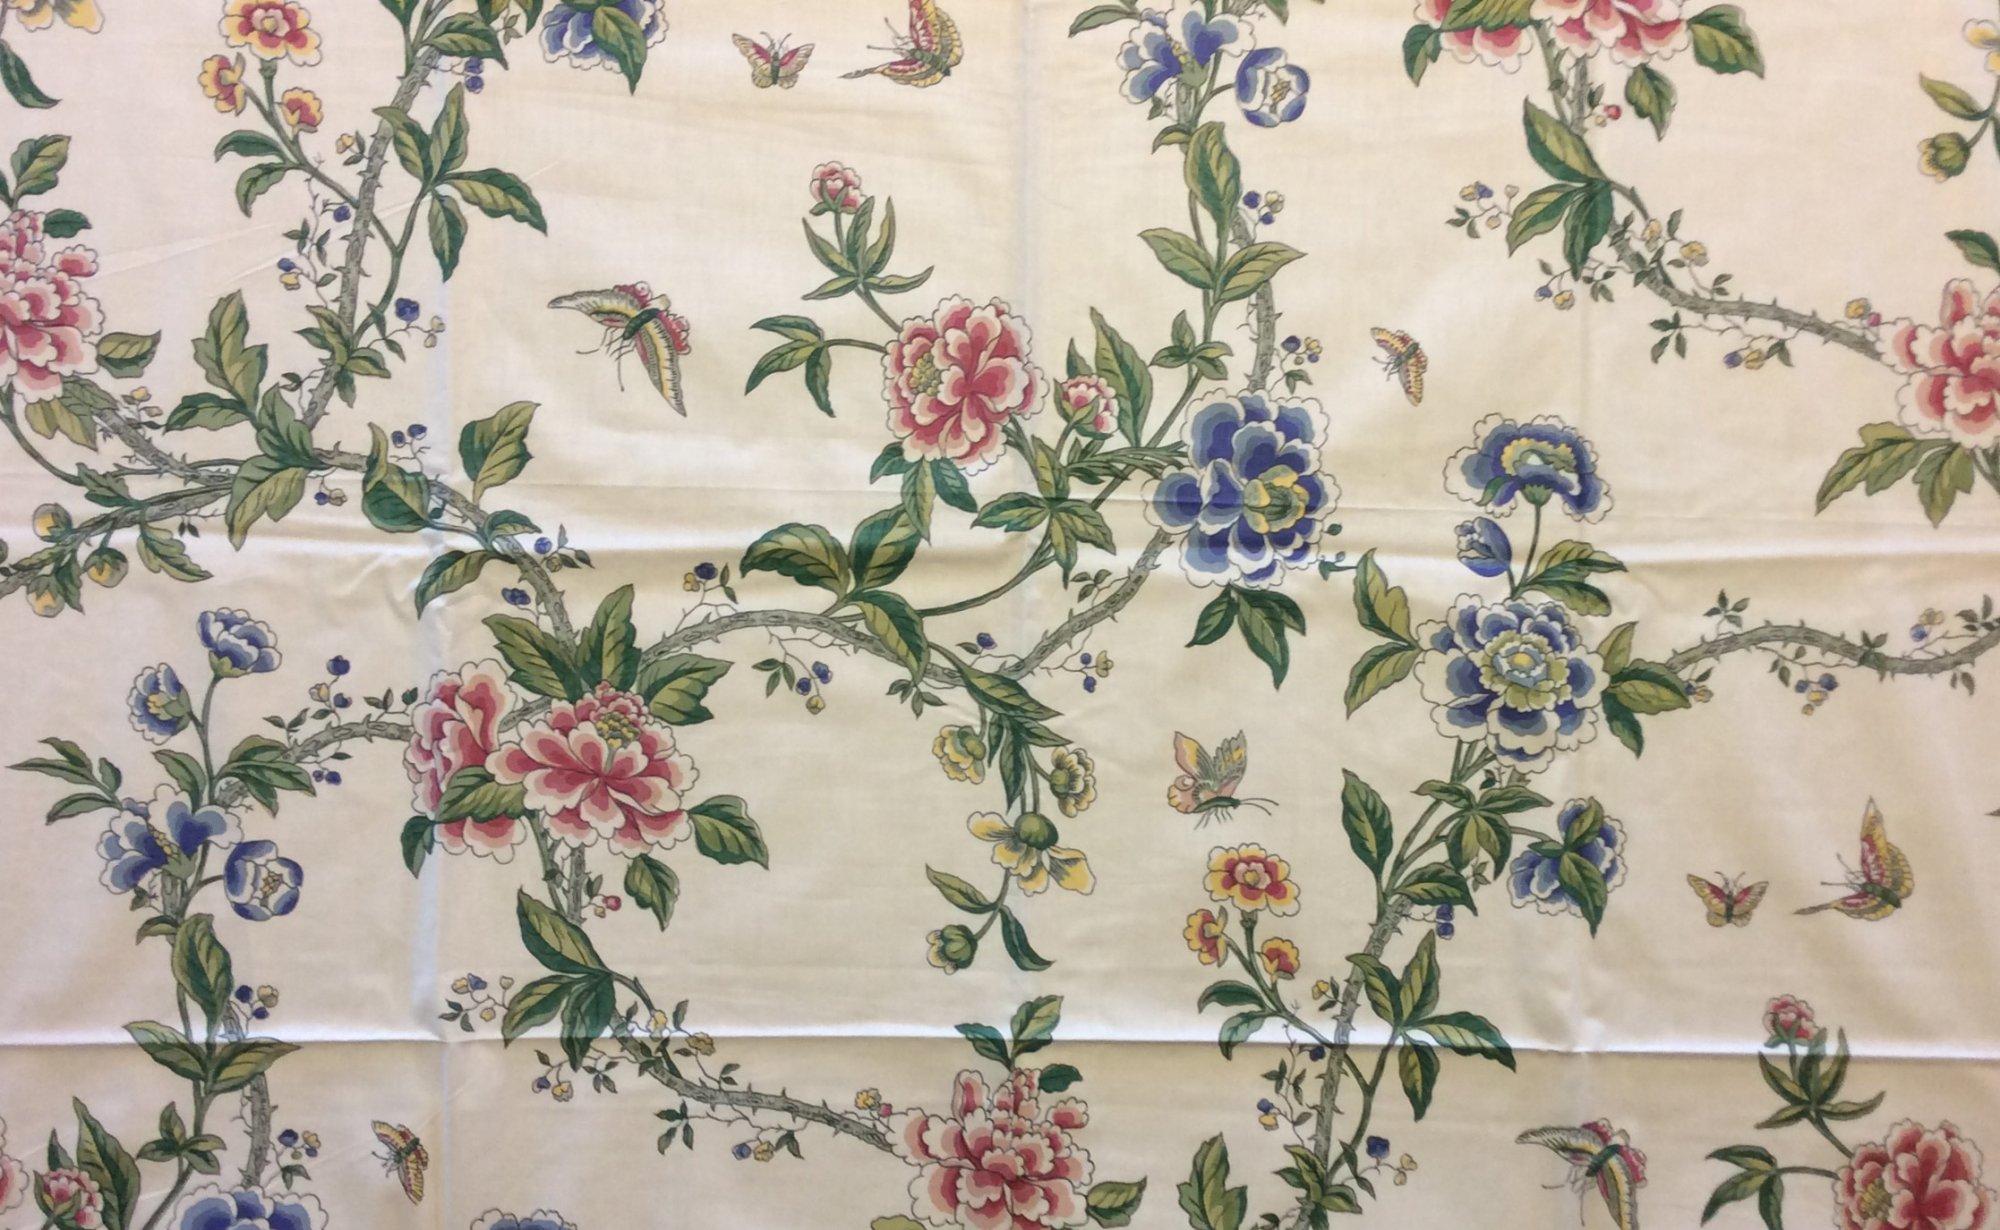 Brunschwig & Fils Flowering Tree Cotton Chintz Floral Vining Vintage Shabby Chic Home Decor Fabric JG070